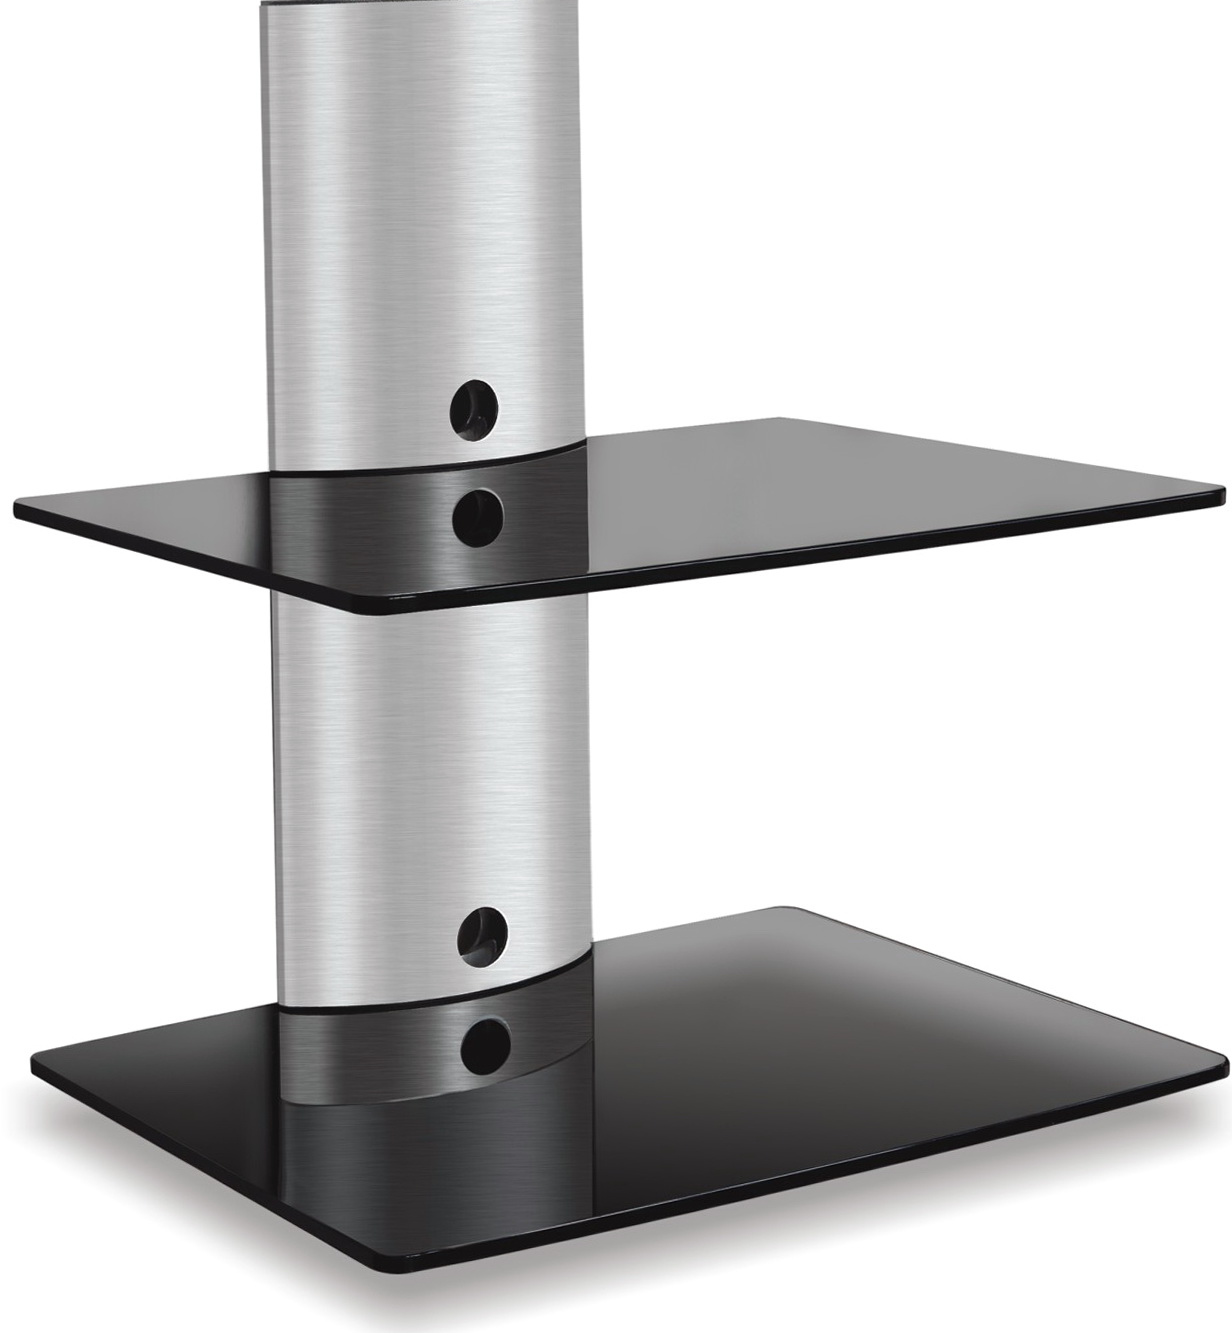 Glass Wall Mount Dvd Shelf